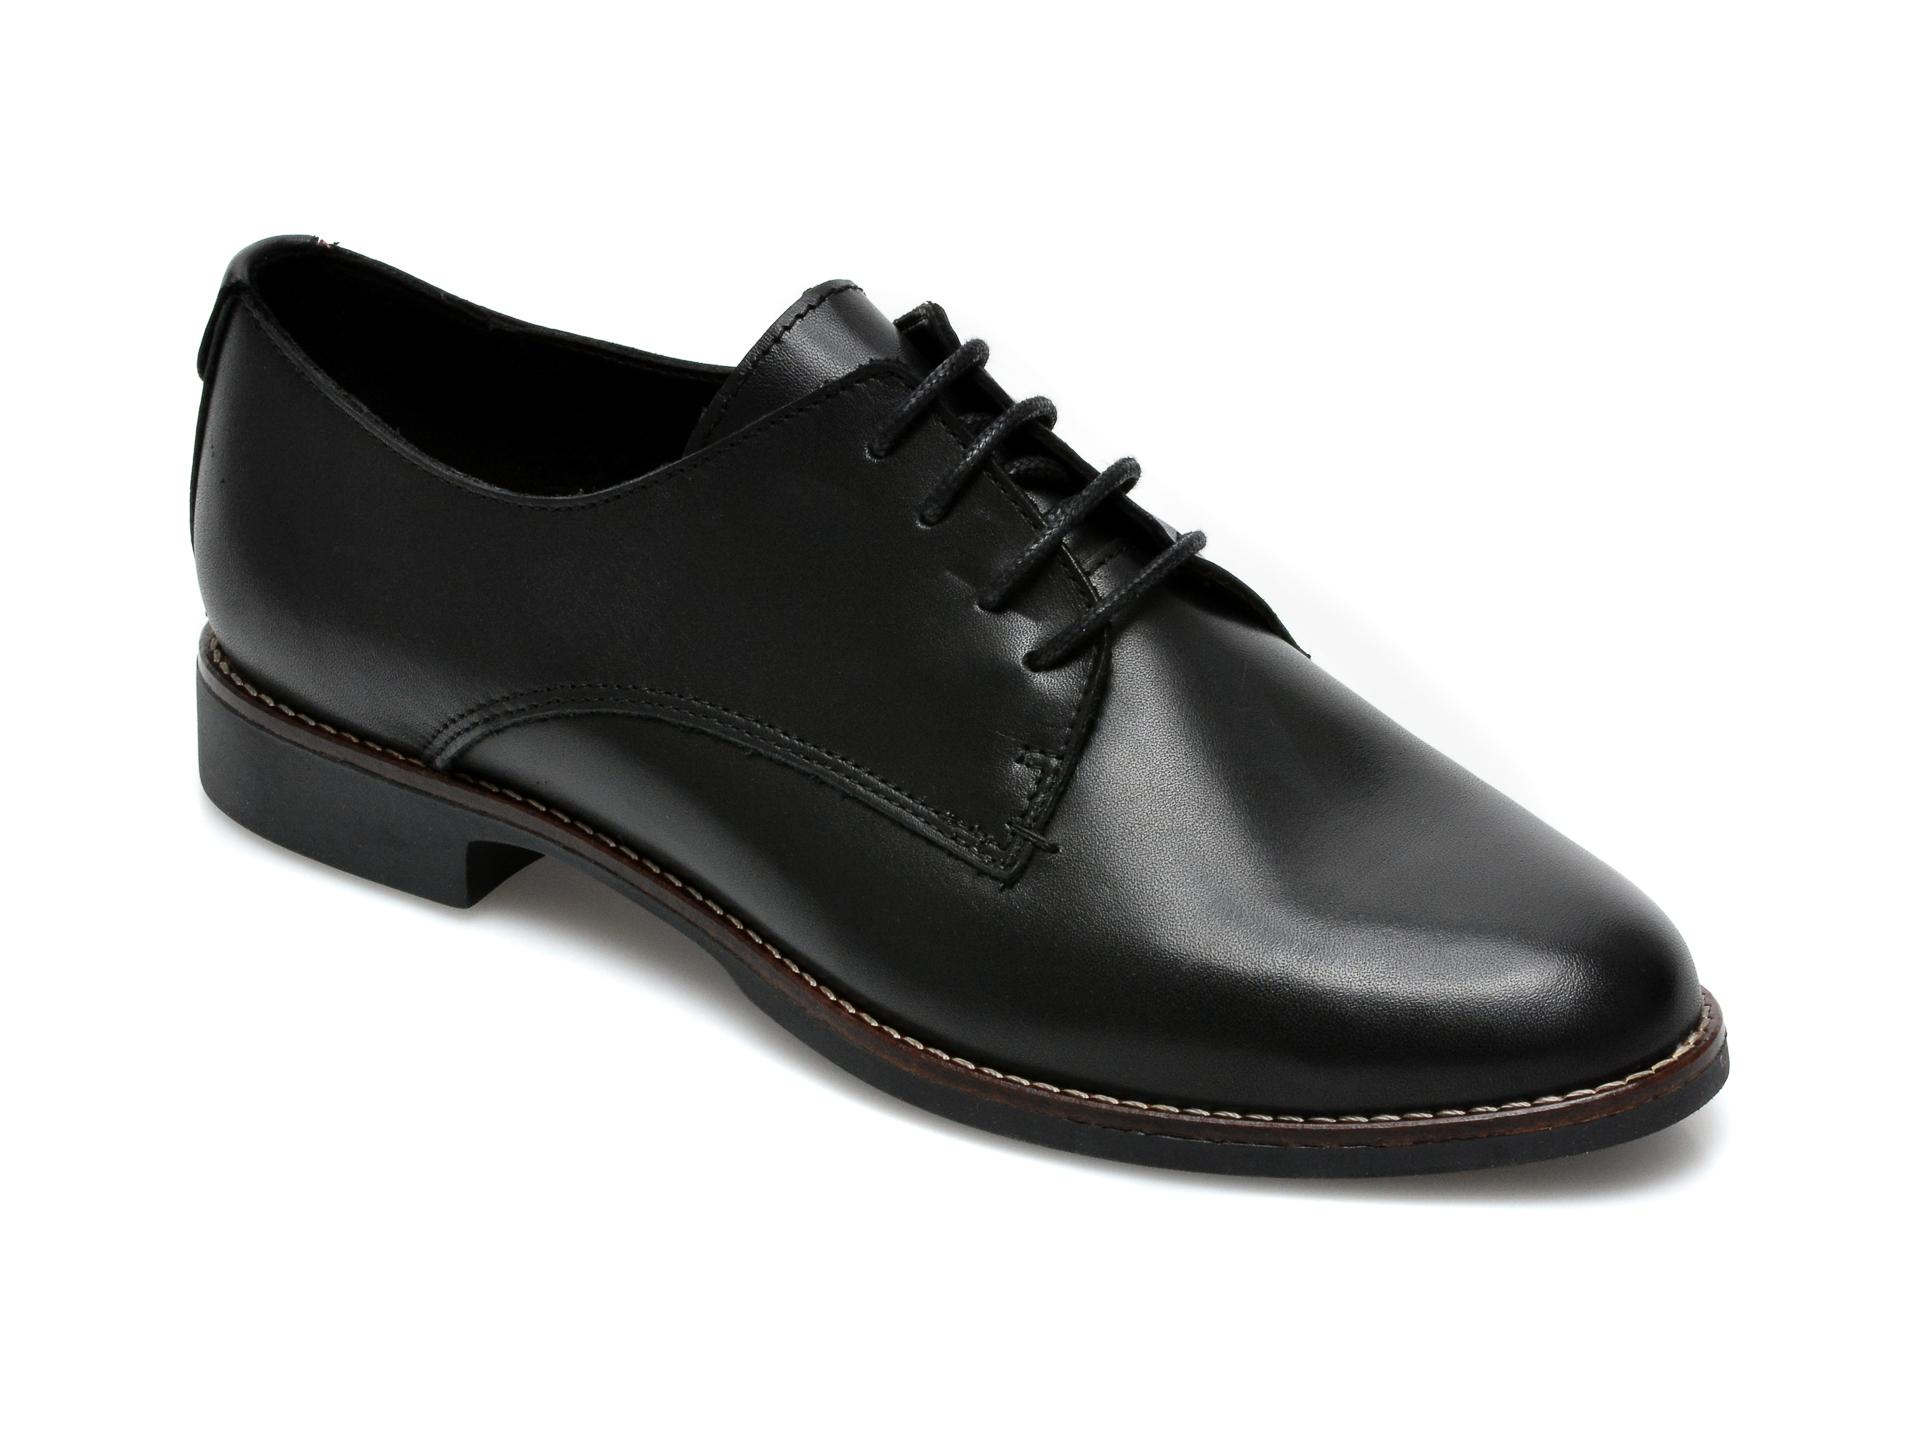 Pantofi ALDO negri, 12924009, din piele naturala imagine 2021 Aldo